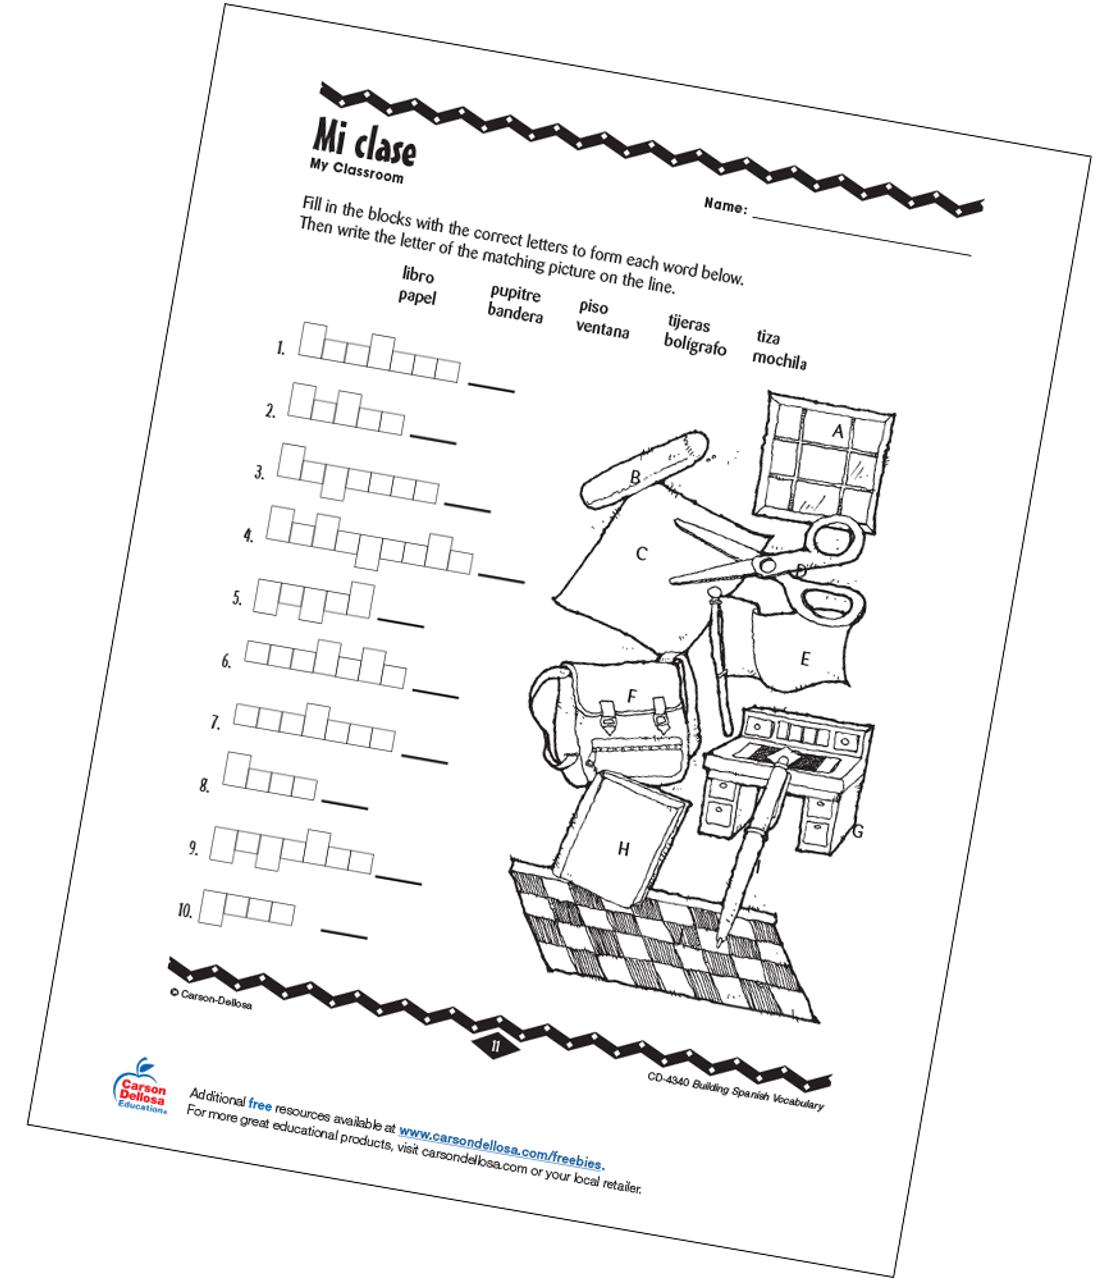 medium resolution of My Classroom Grade PK-12 Spanish Free Printable   Carson Dellosa